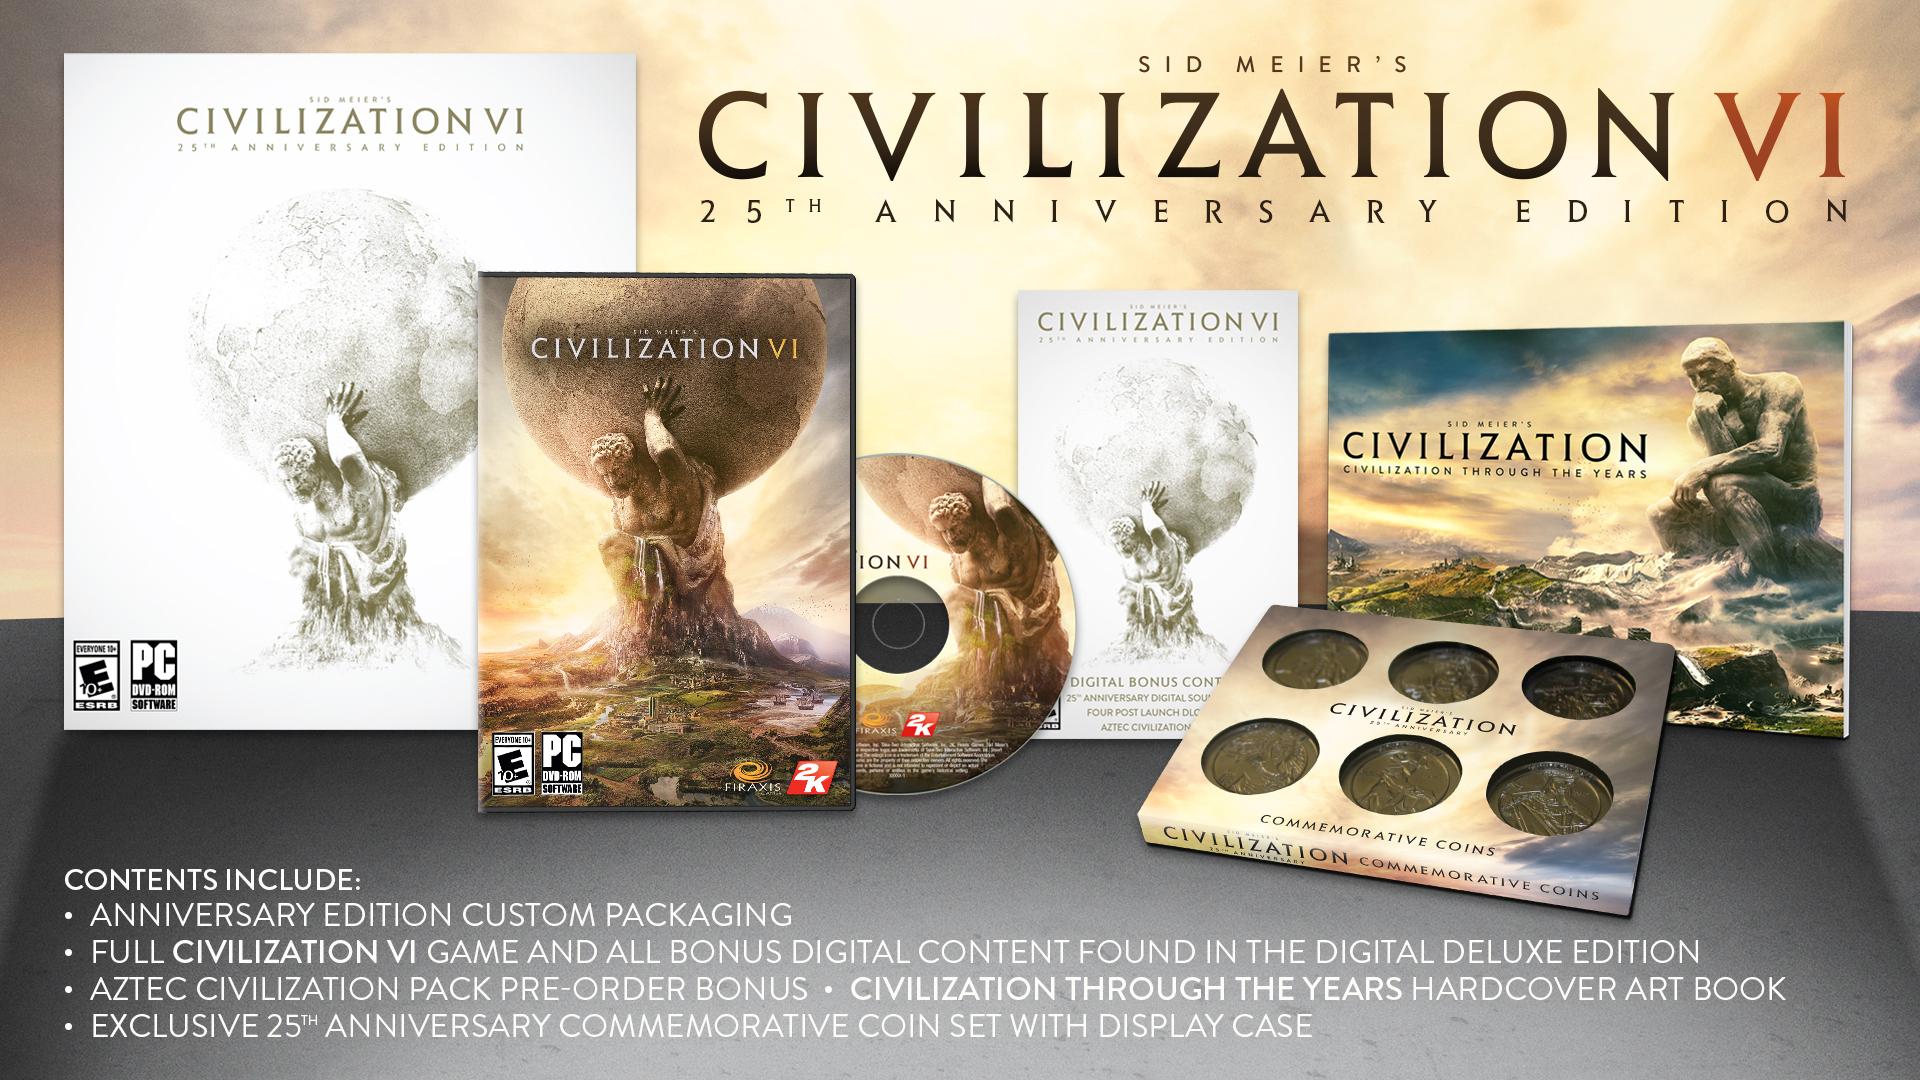 Sid Meier's Civilization VI_Limited_Edition.jpg